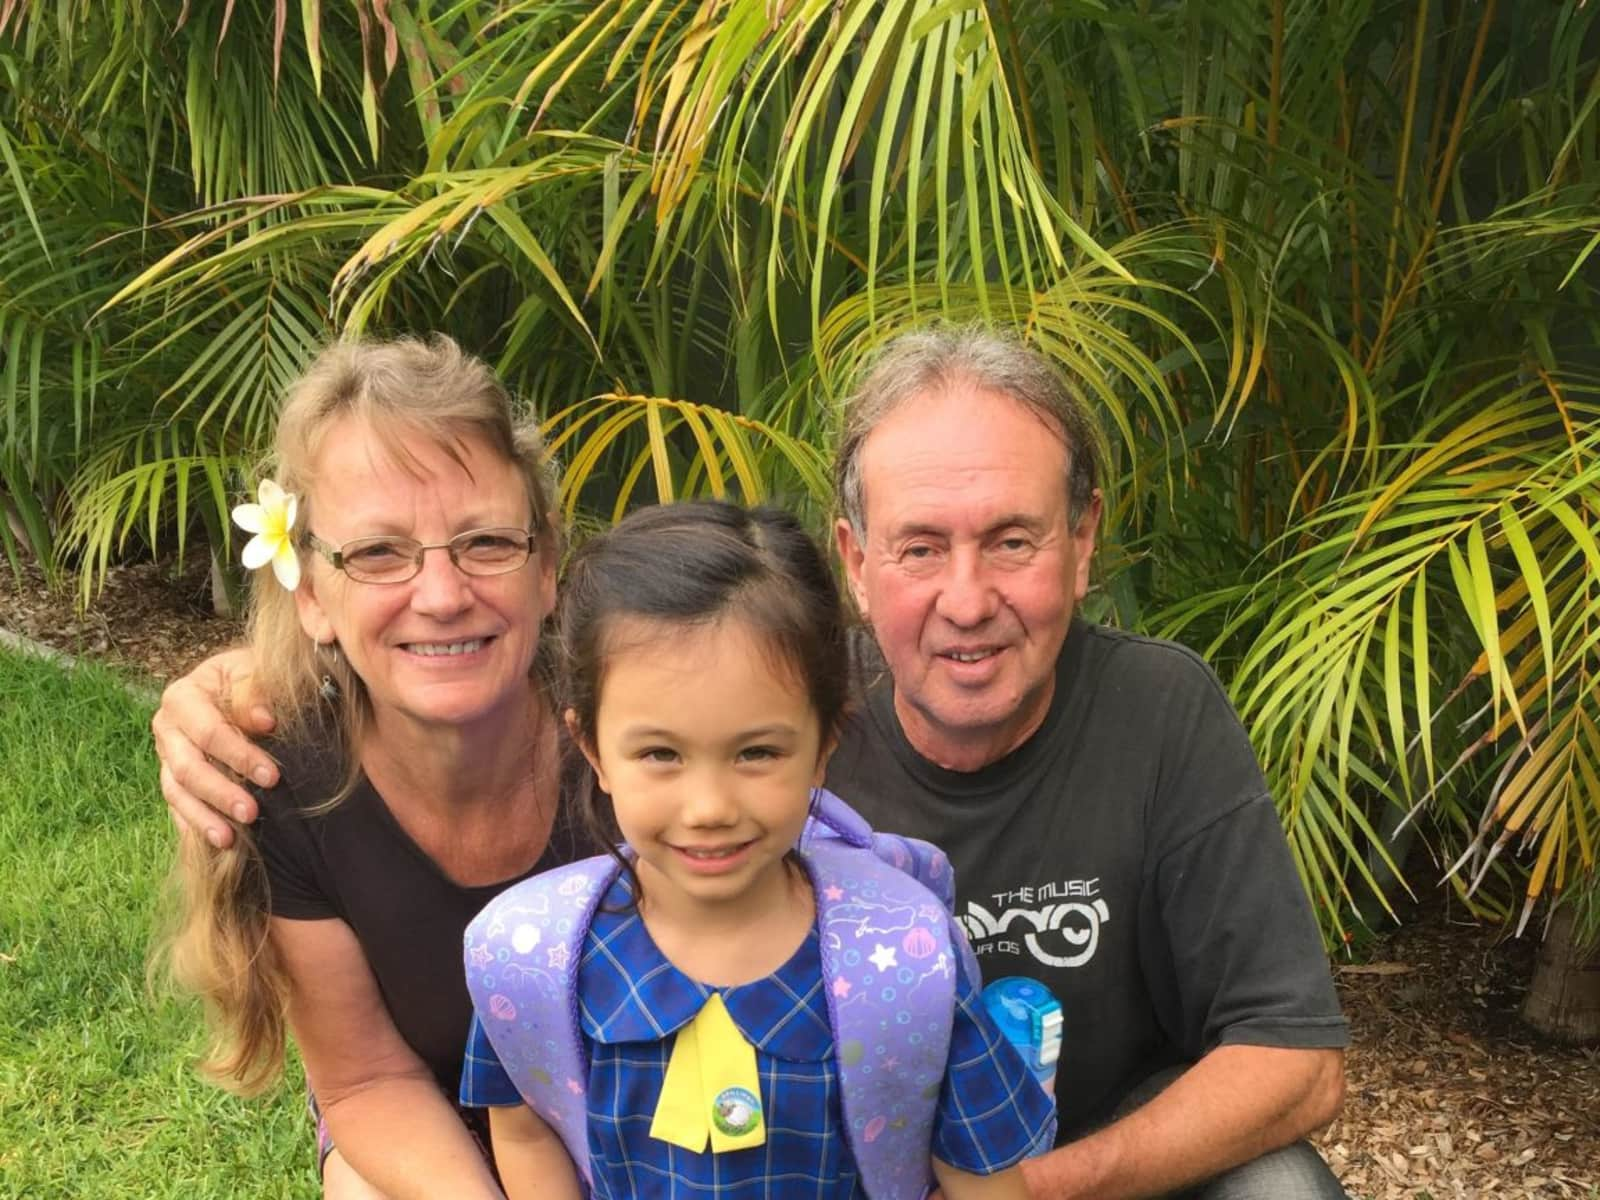 Rosie & Stuart from Arcadia vale, New South Wales, Australia